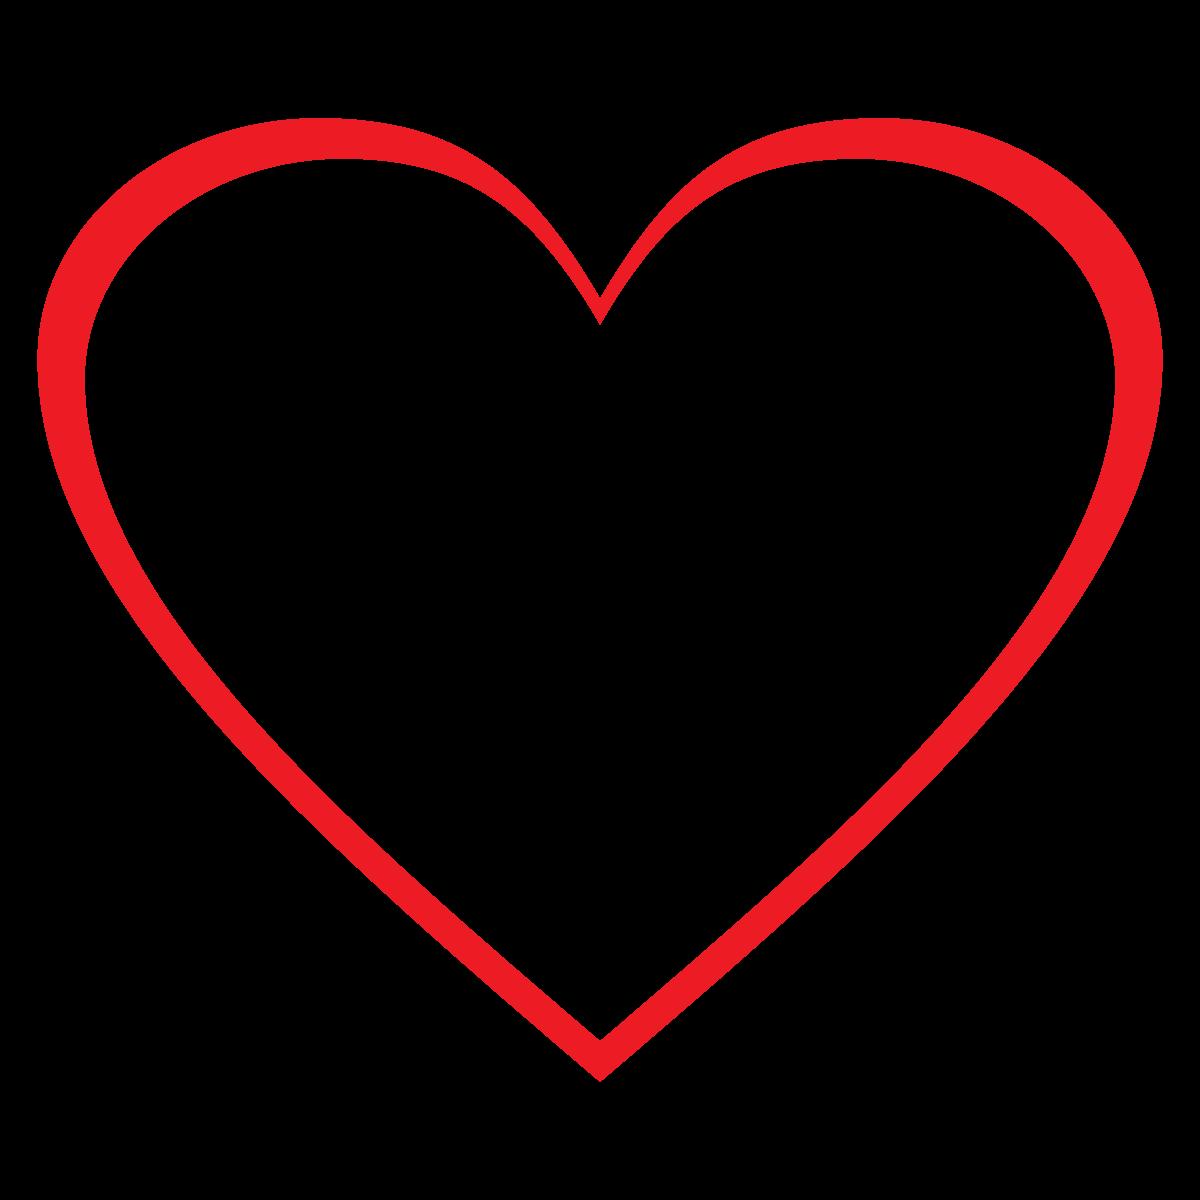 Hearts clipart heart outline Hearts Clipart Art Clip Clipart